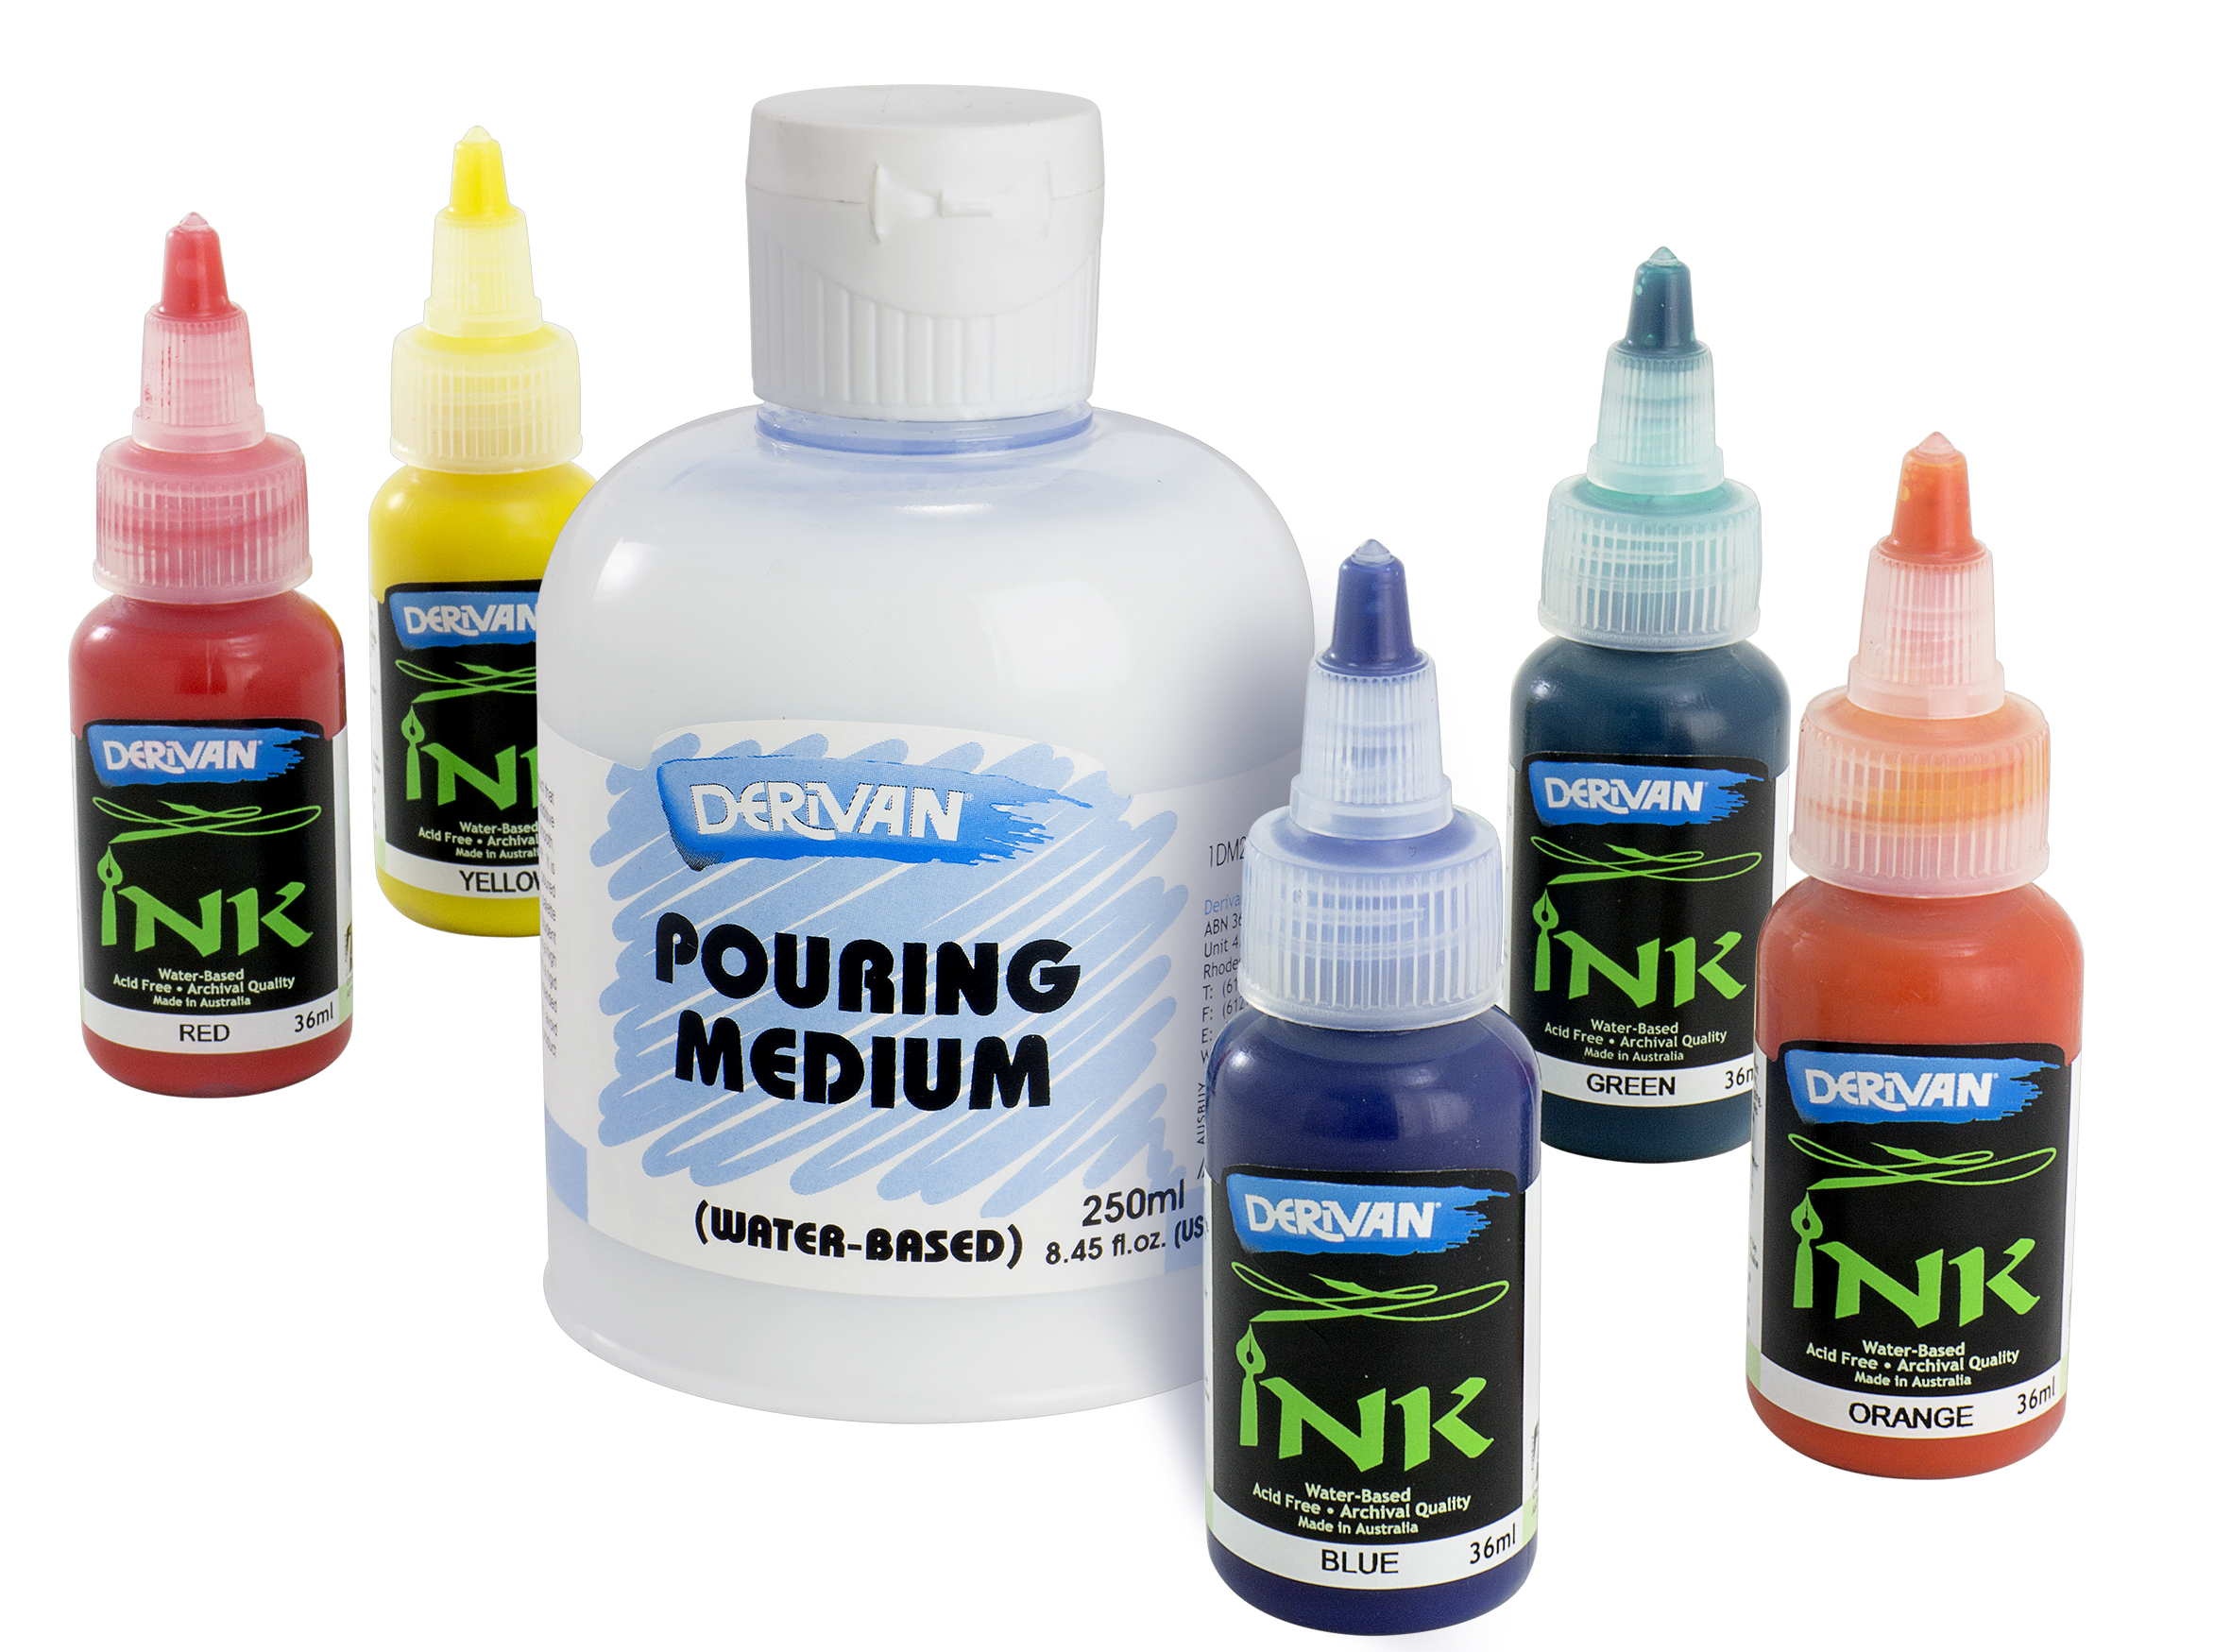 Derivan Pouring Medium